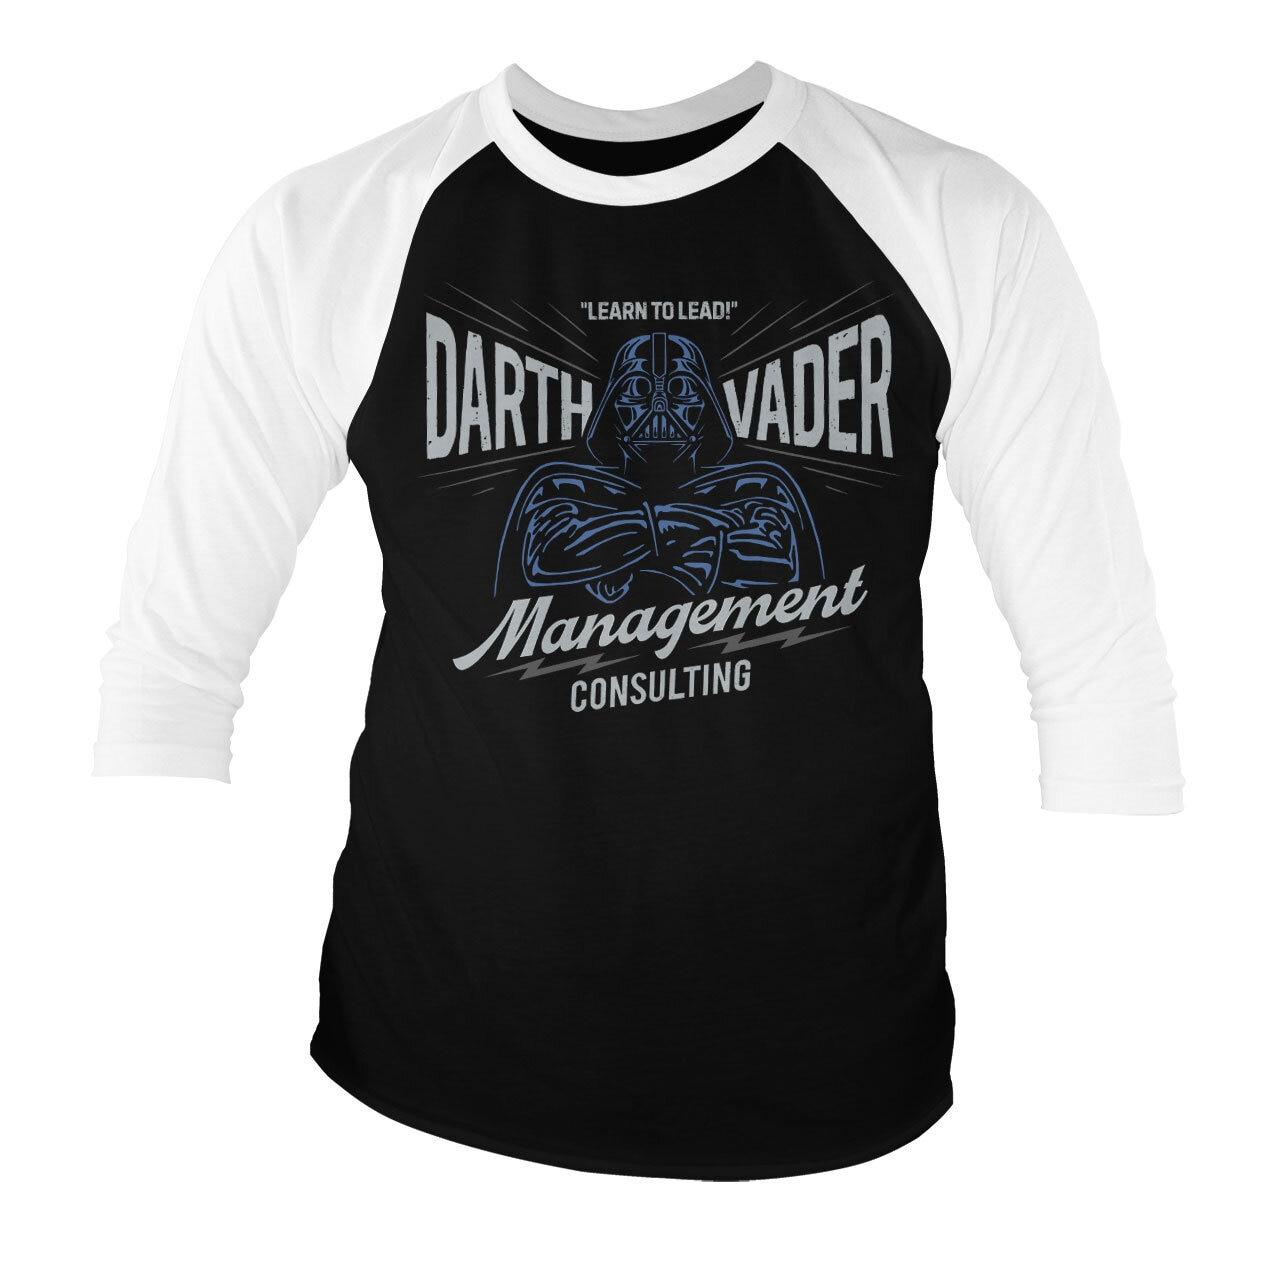 Darth Vader Management Consulting Baseball 3/4 Sleeve Tee